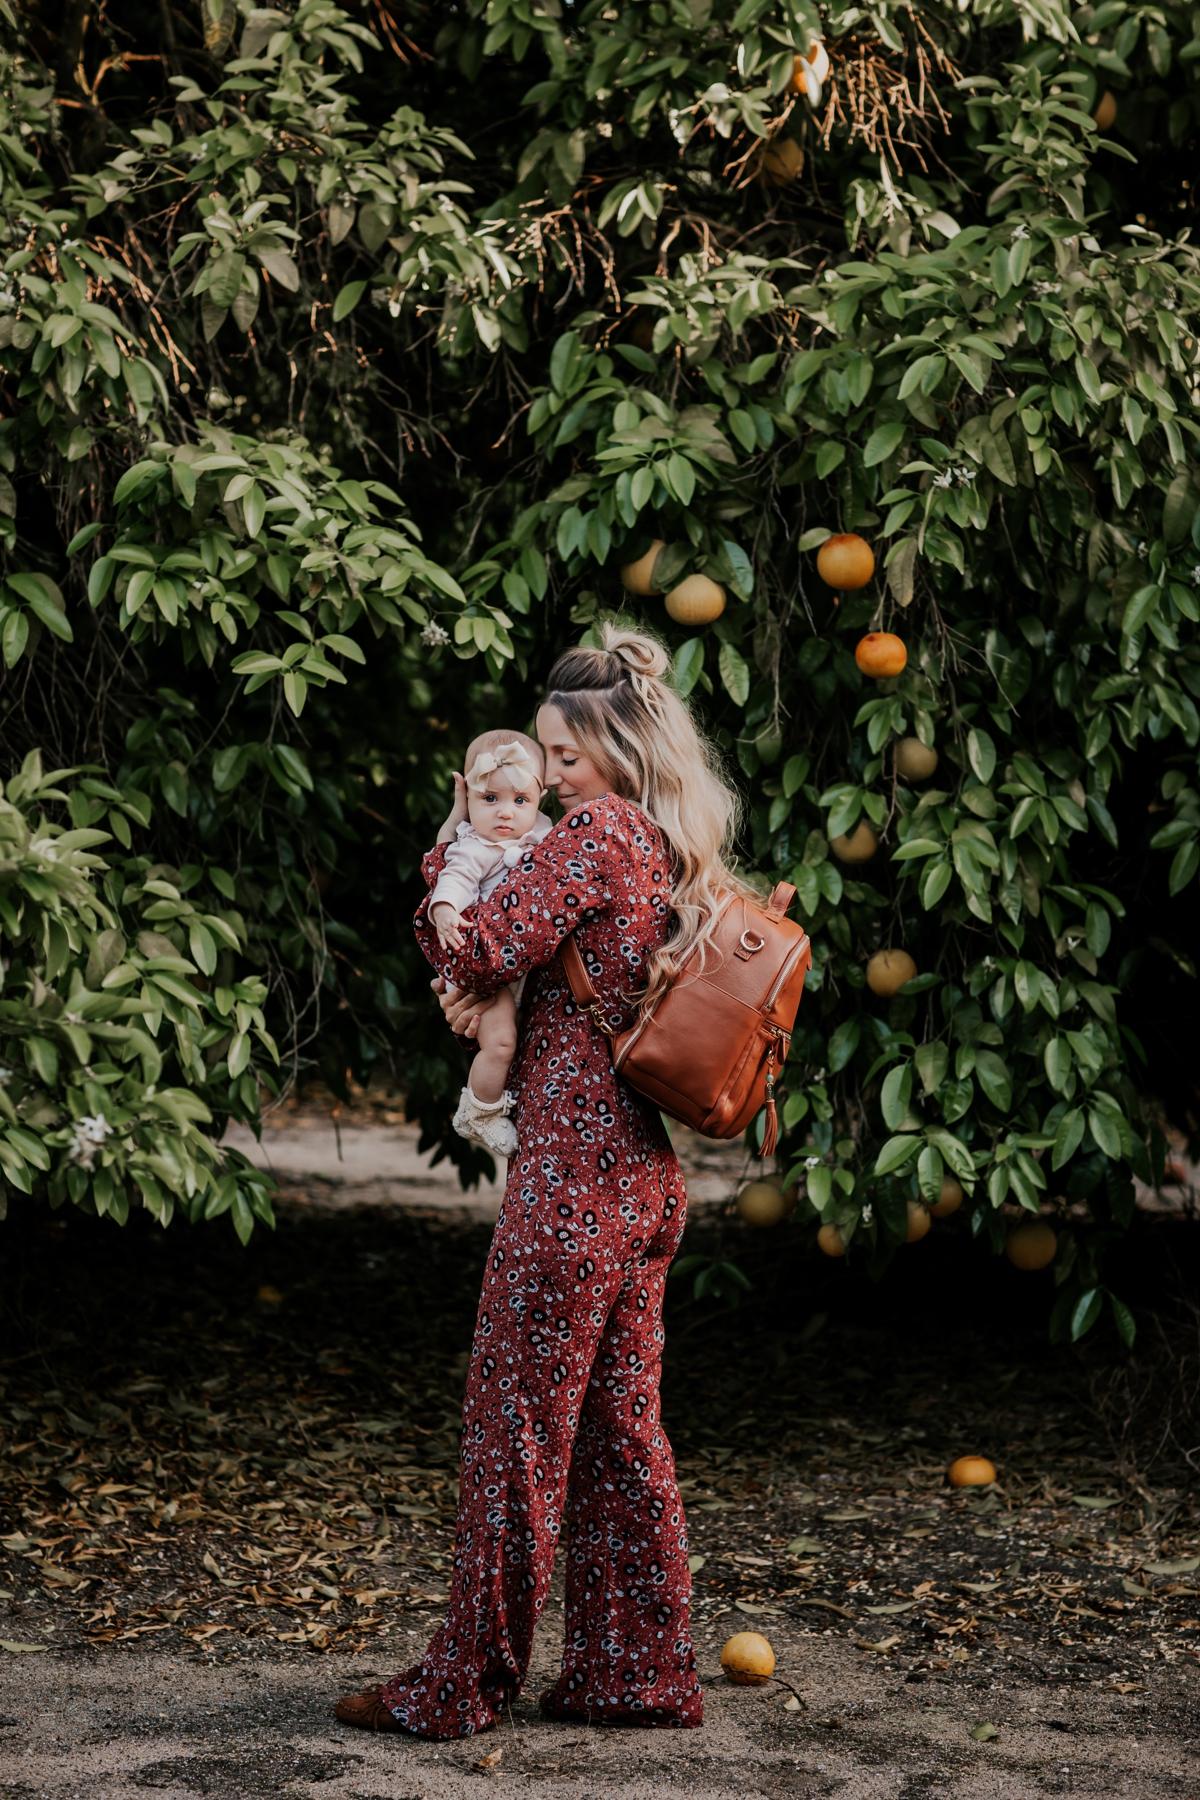 Kandis_Marino_Photography_Lifestyle_Lily_Jade_Diaper_Bag_Influencer_Abassador_Baby_Mom_Blogger_Mommy_Blog_Newborn_Pregnancy_0012.jpg